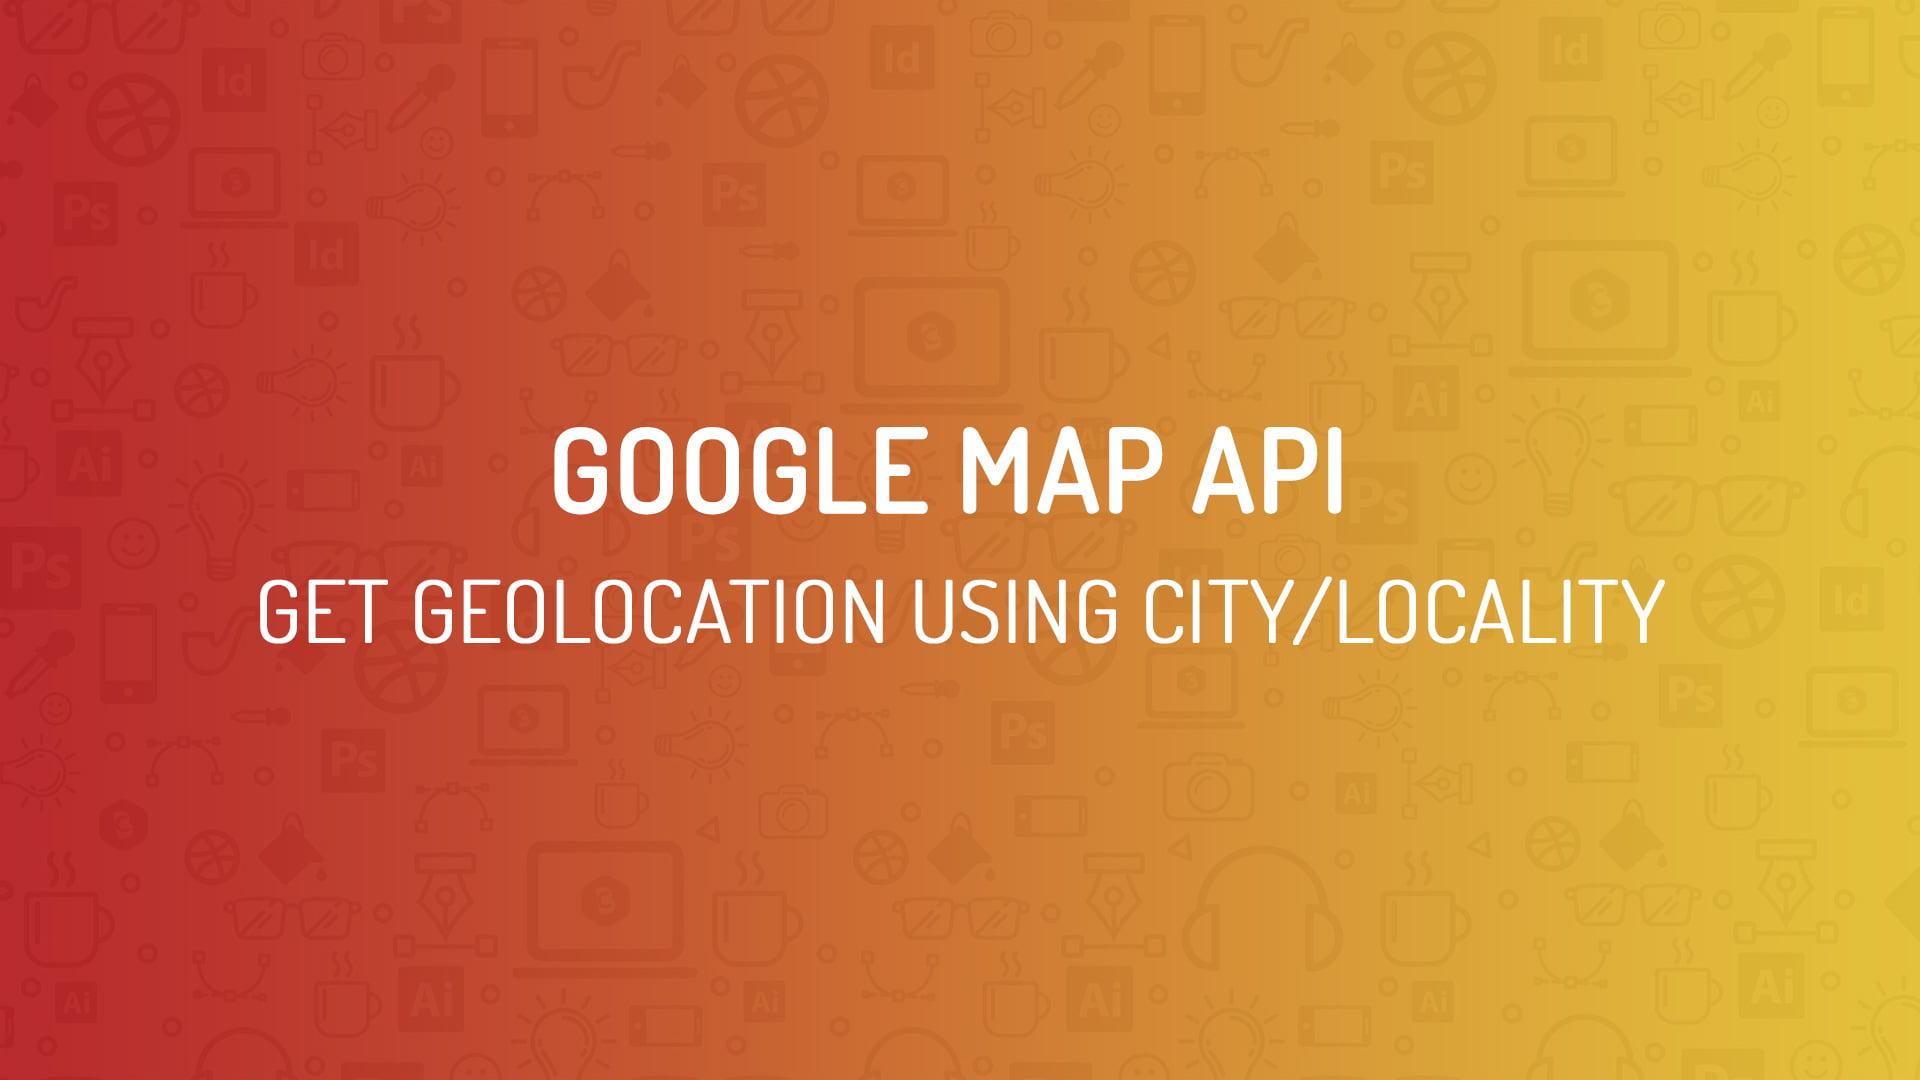 Google Map API - Get Geolocation using City/Locality - Code ... on bmw location map, usa location map, estuary location map, dacia location map, ip location map, peterbilt location map, harley-davidson location map, freshwater marsh location map, jaguar location map, post location map, berlin location map, gat location map, great wall location map, noble location map,